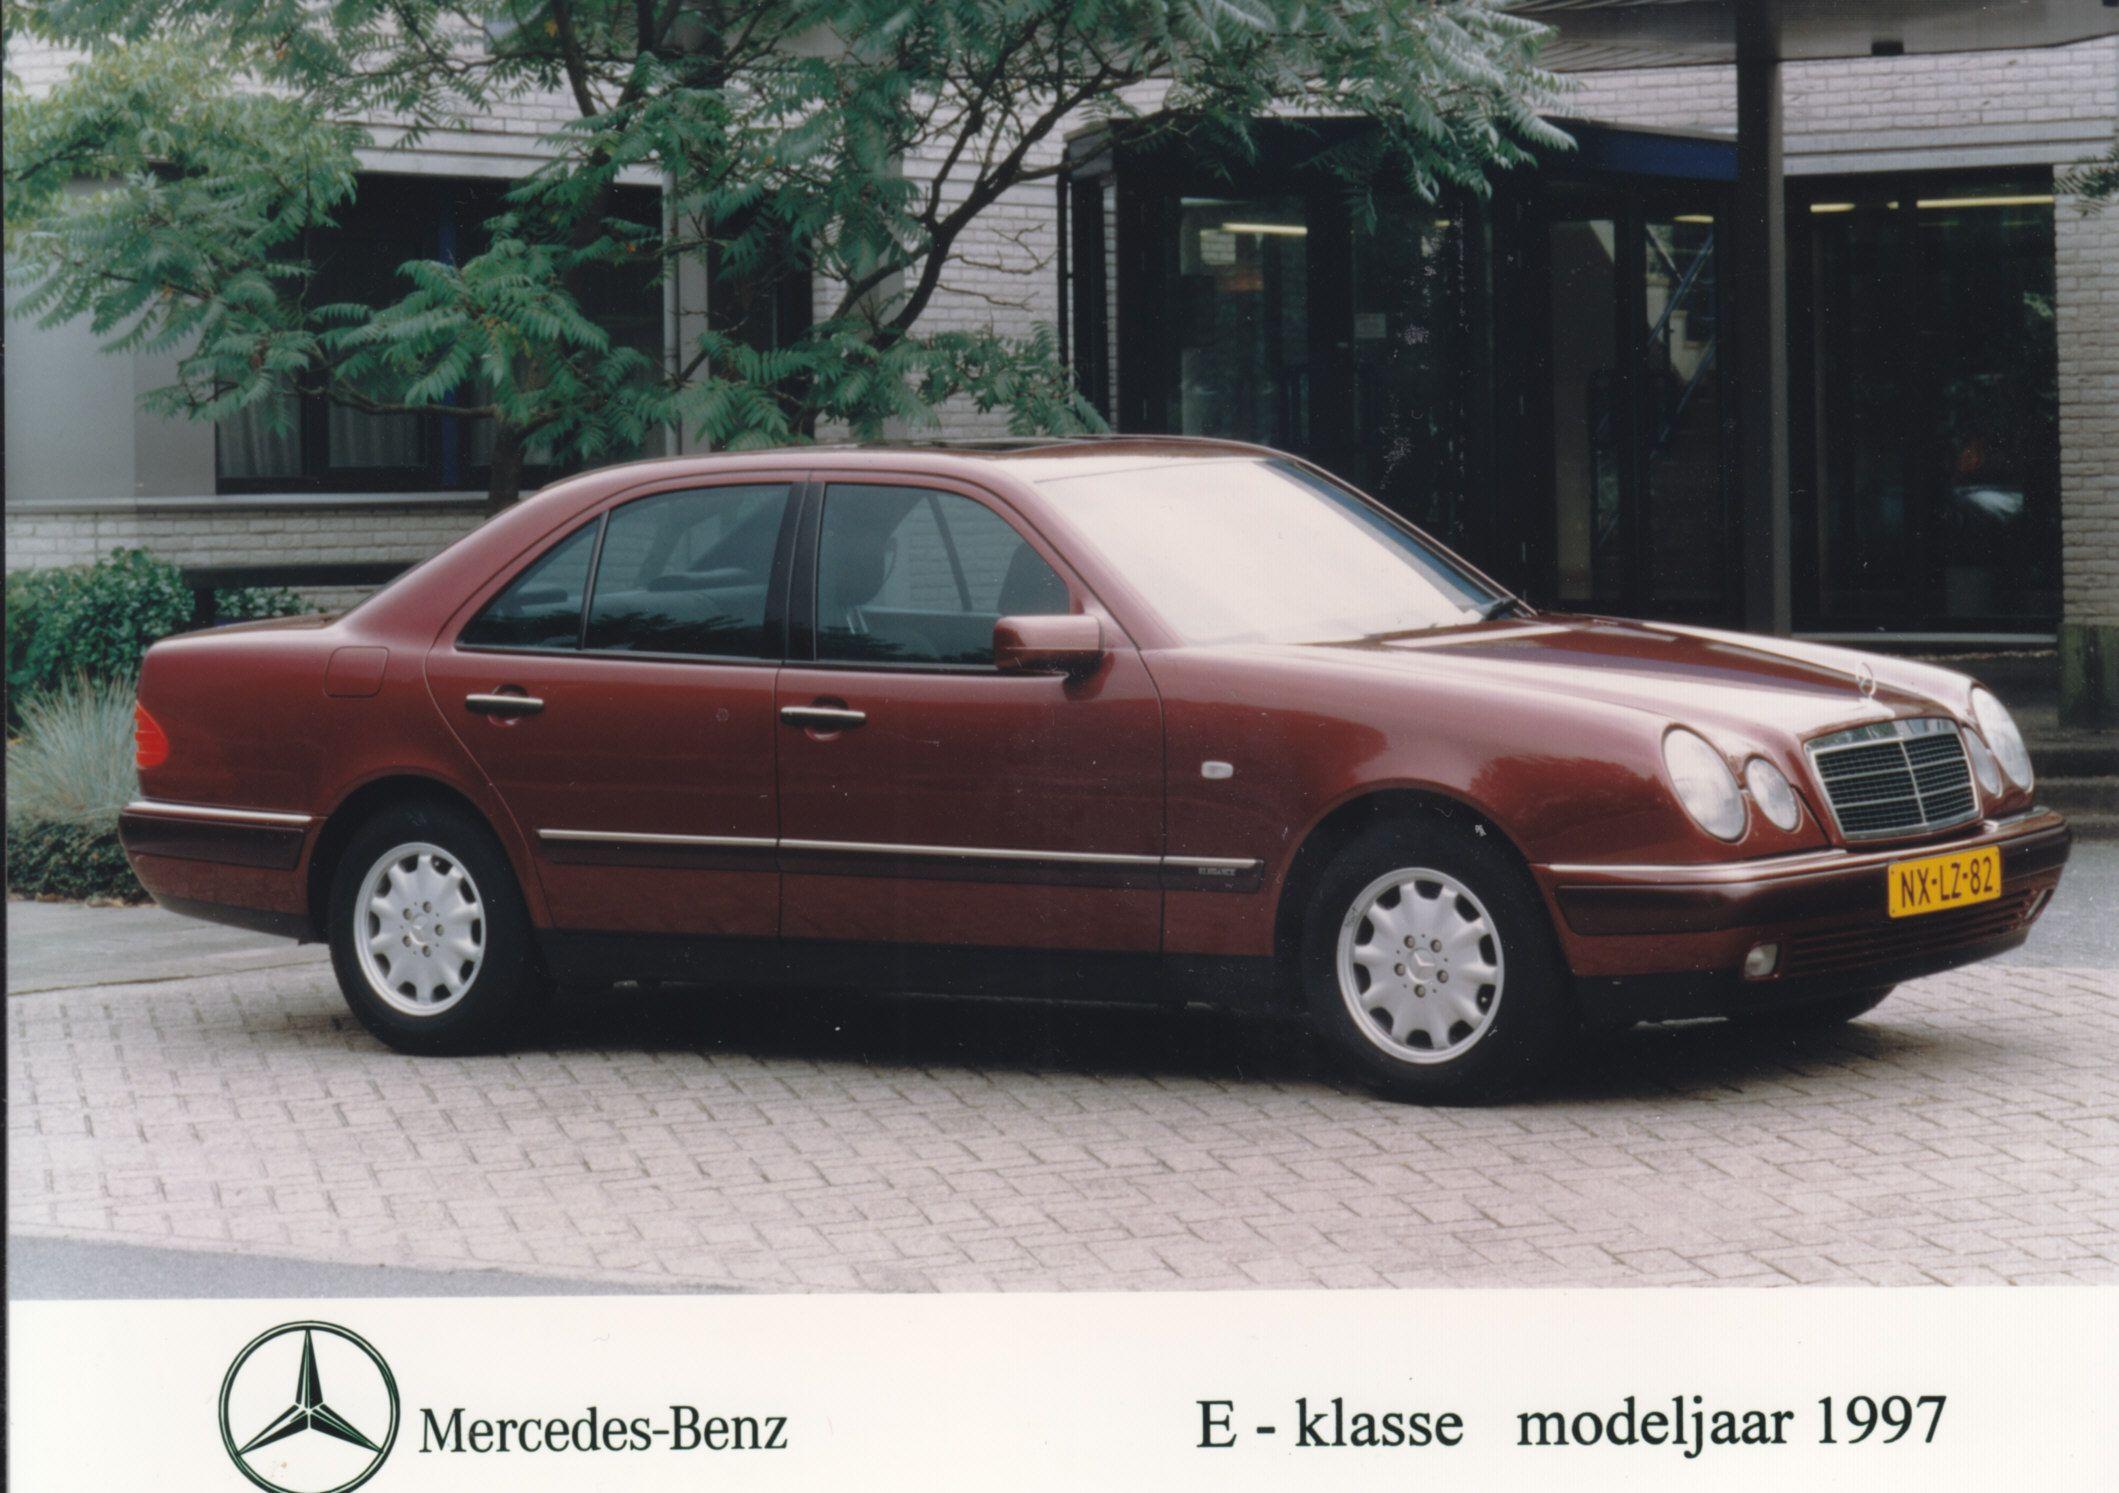 mercedes benz e class dutch rai 1997  [ 2119 x 1493 Pixel ]